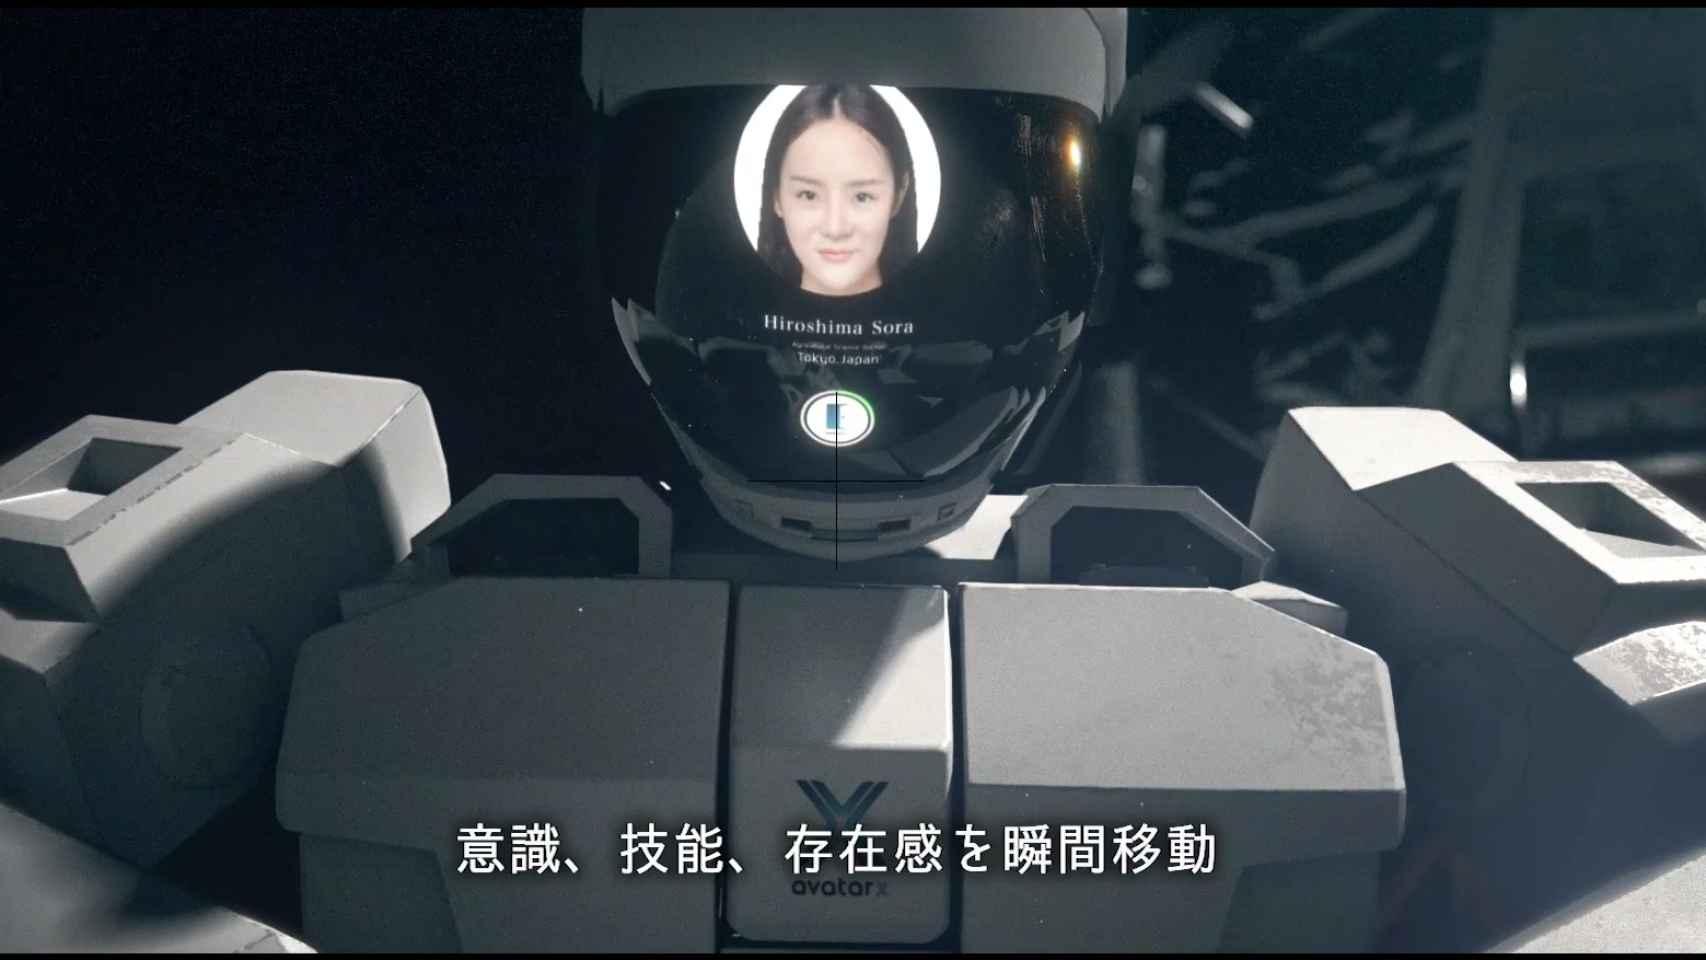 Avatar X Program